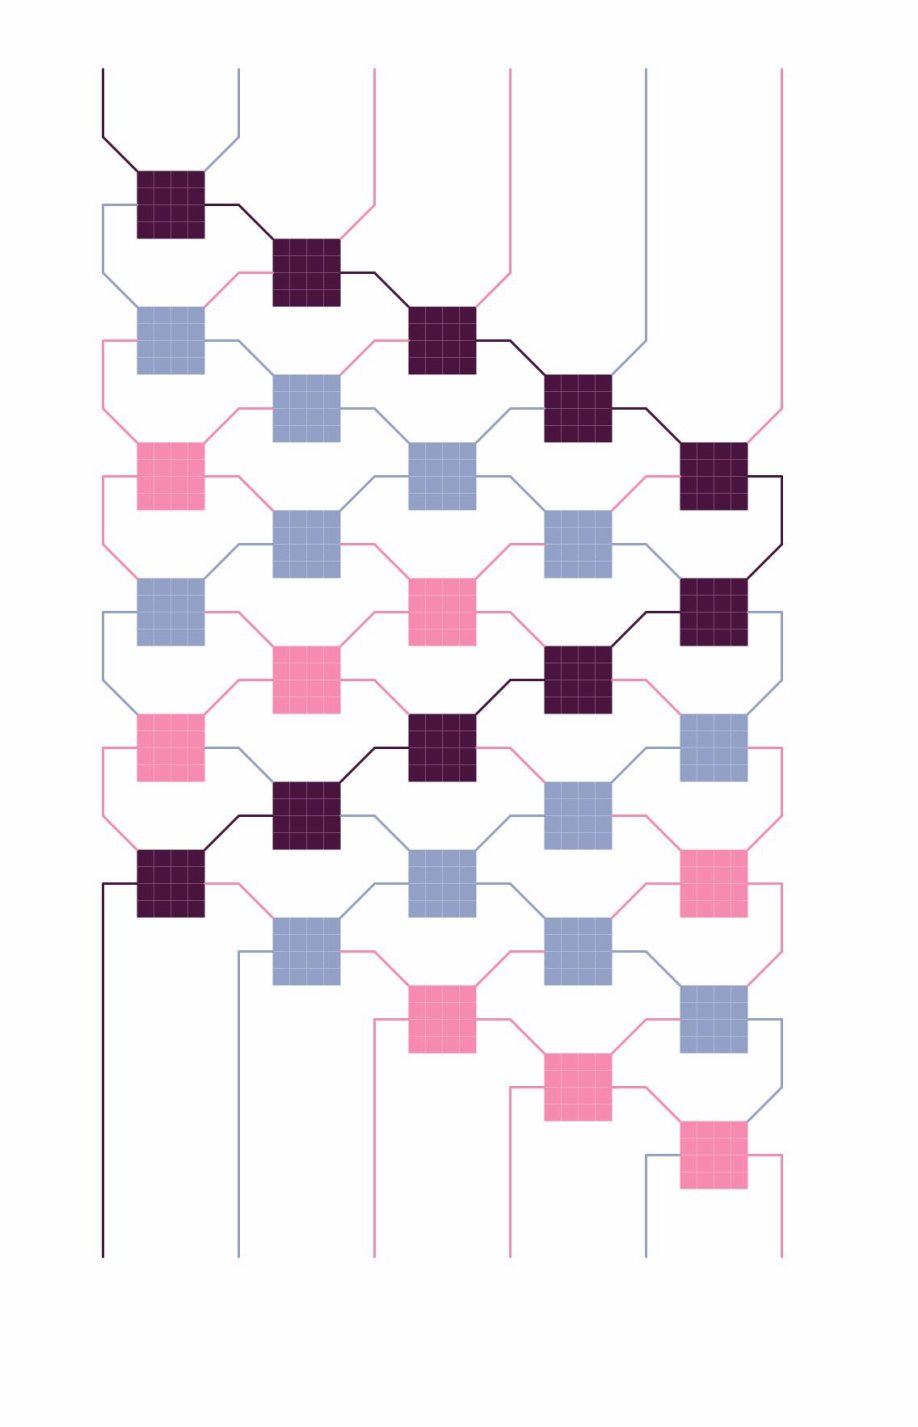 Zigzag pattern variation b